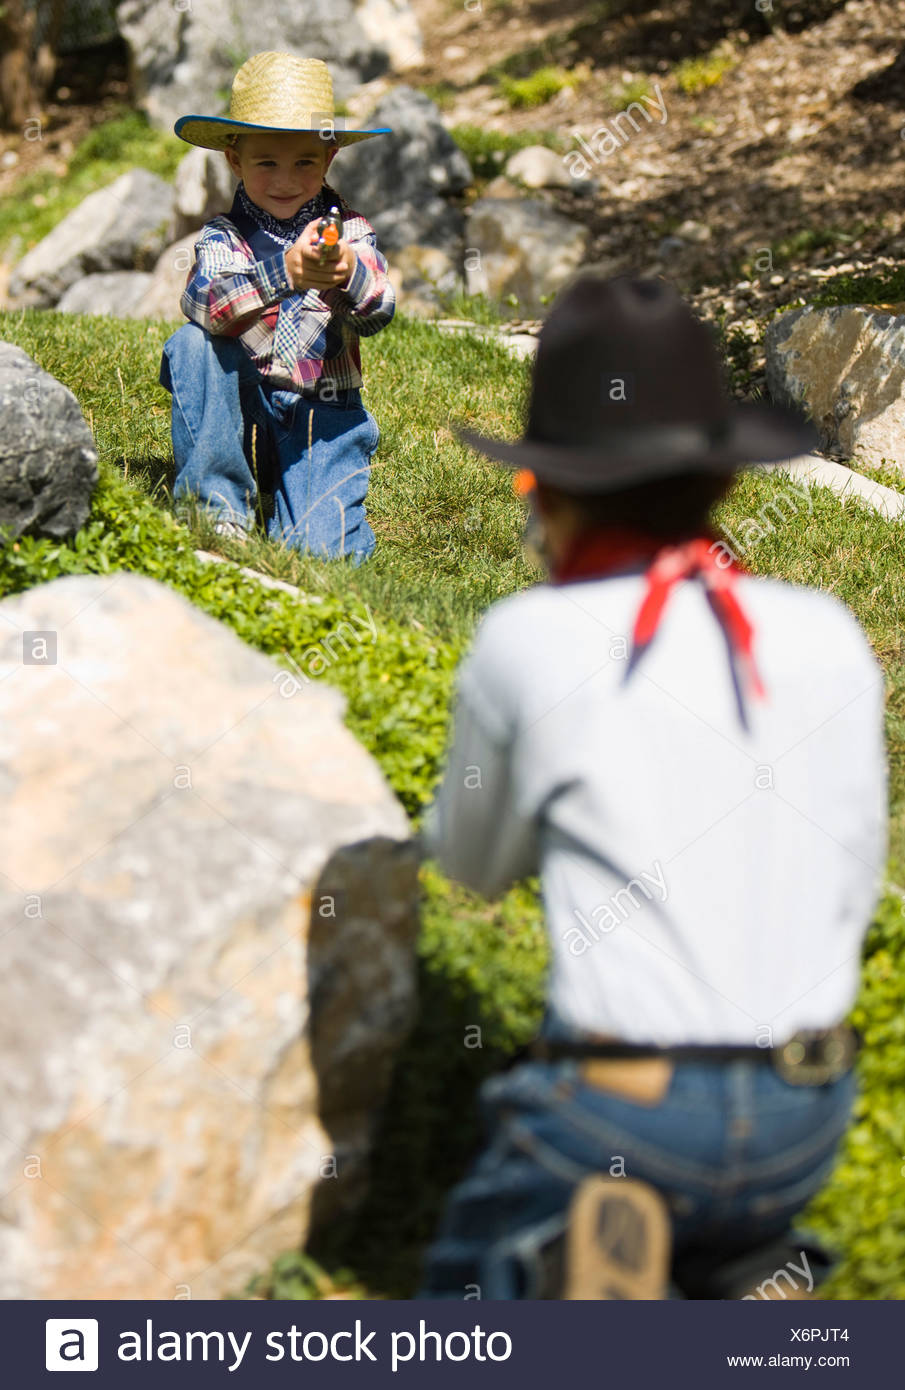 Boys playing outside - Stock Image